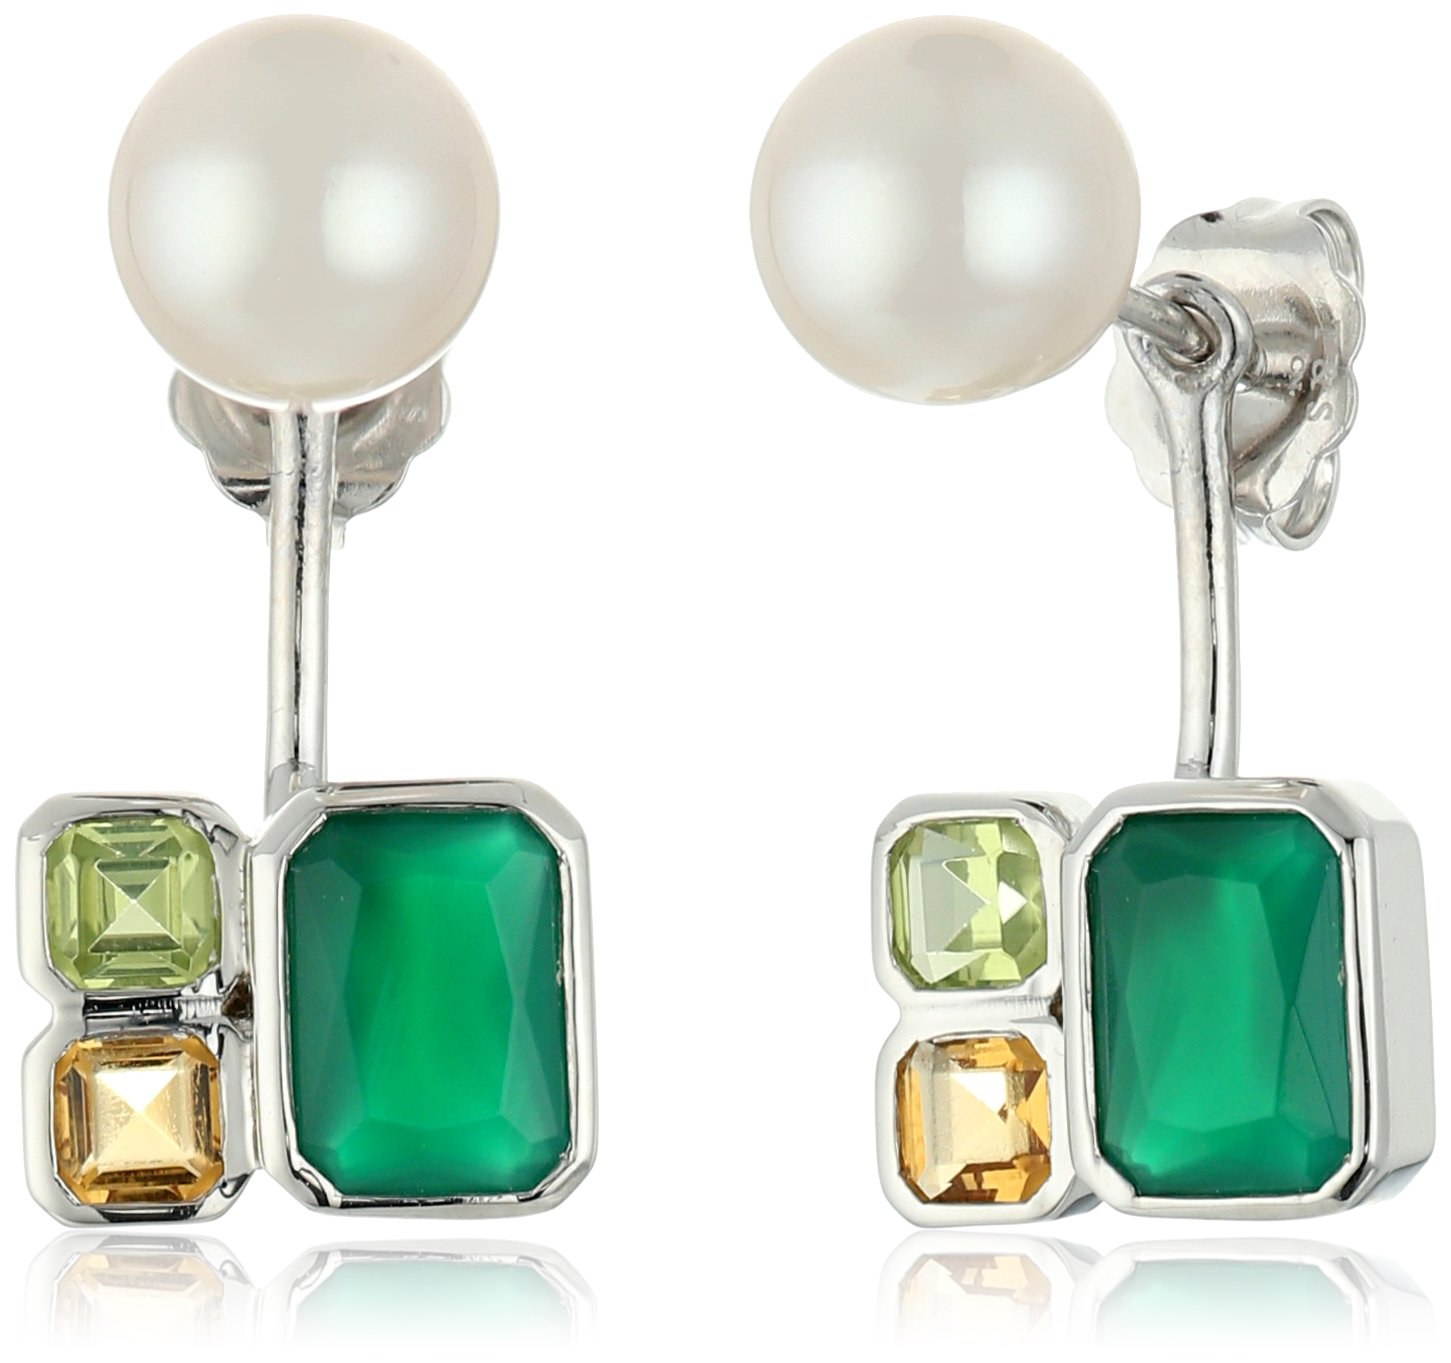 TARA Pearls 7X7.5mm Akoya Pearls, White Topaz, Peridot and Green Agate Jacket Sterling Silver Earring Jackets